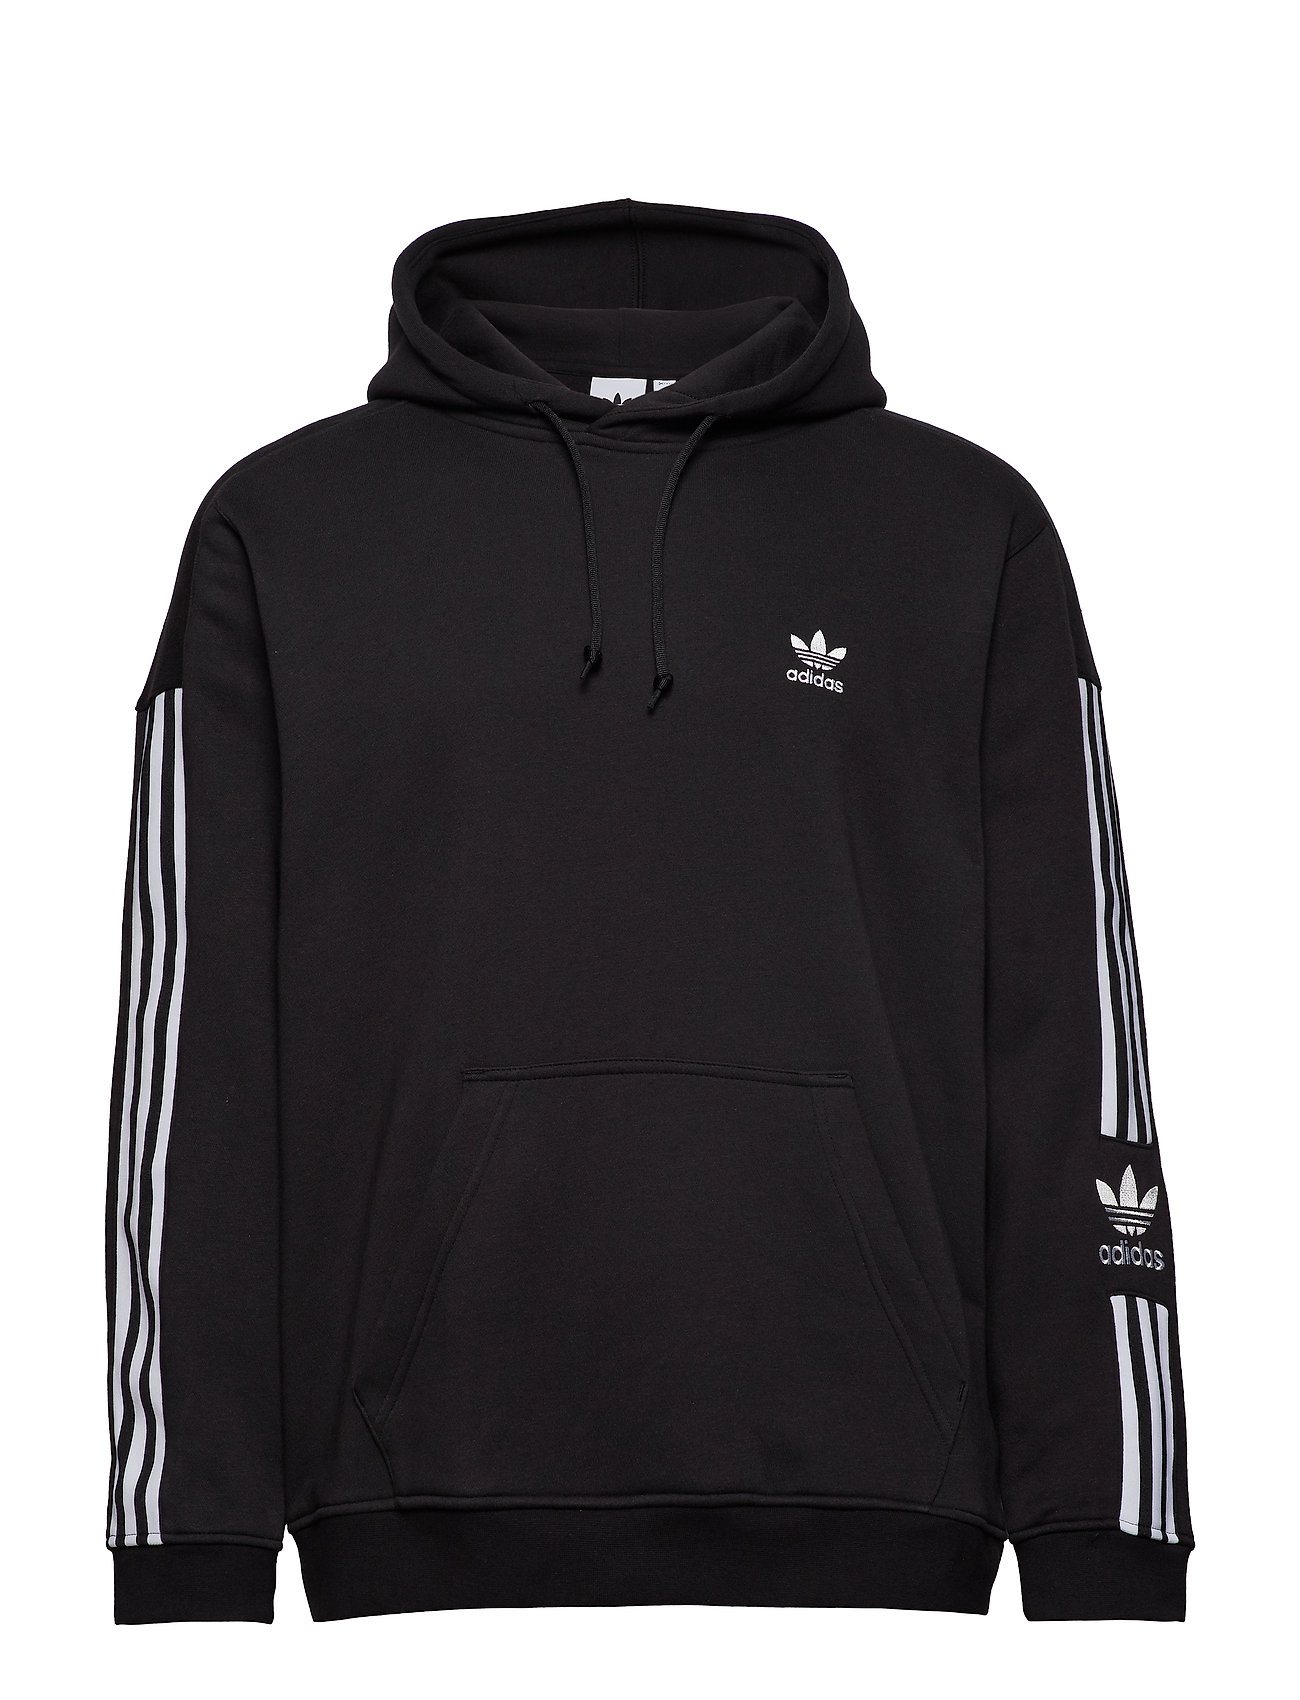 adidas Originals TECH  HOODY - BLACK